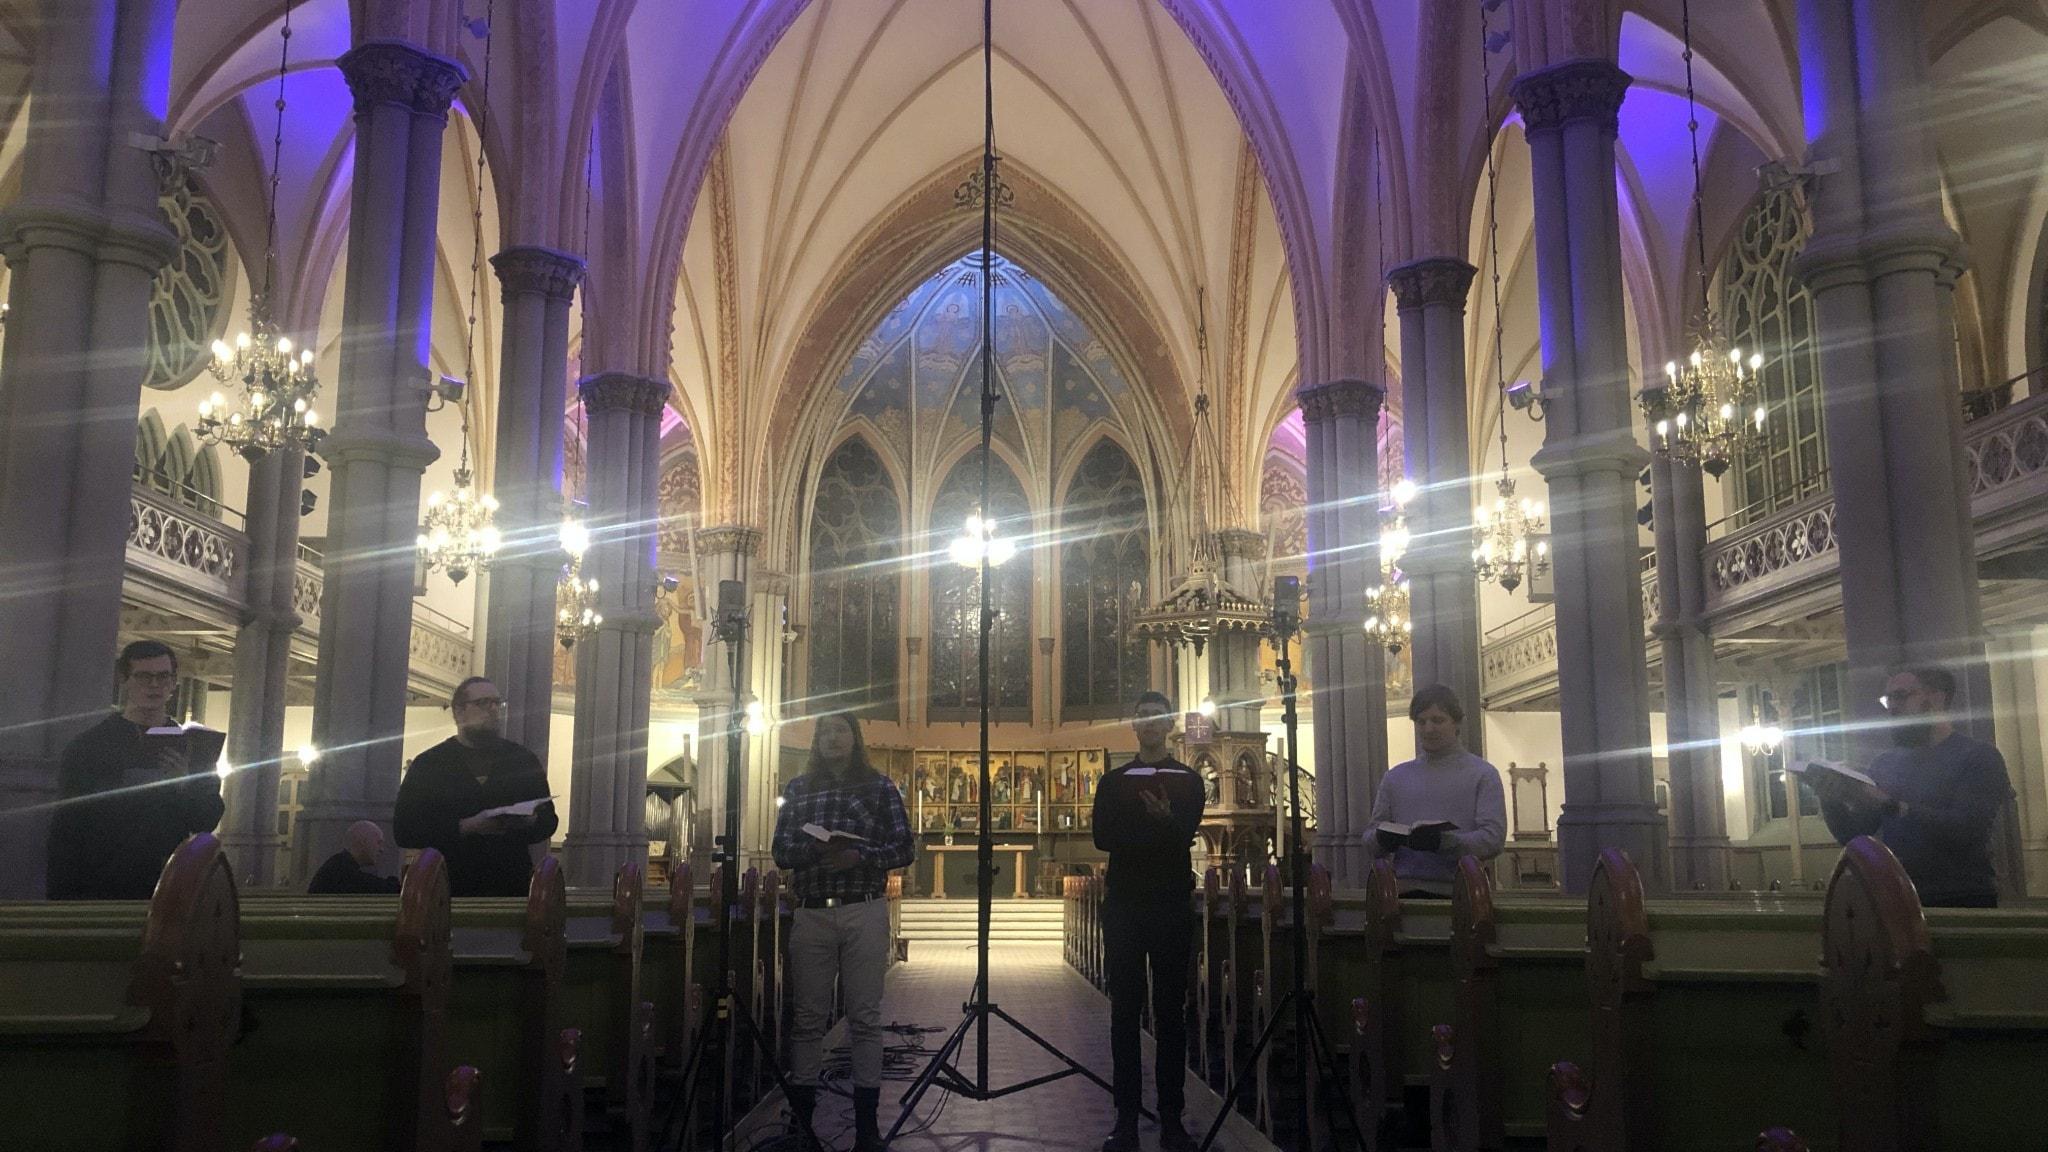 Ars Veritas i Oscar Fredriks kyrka